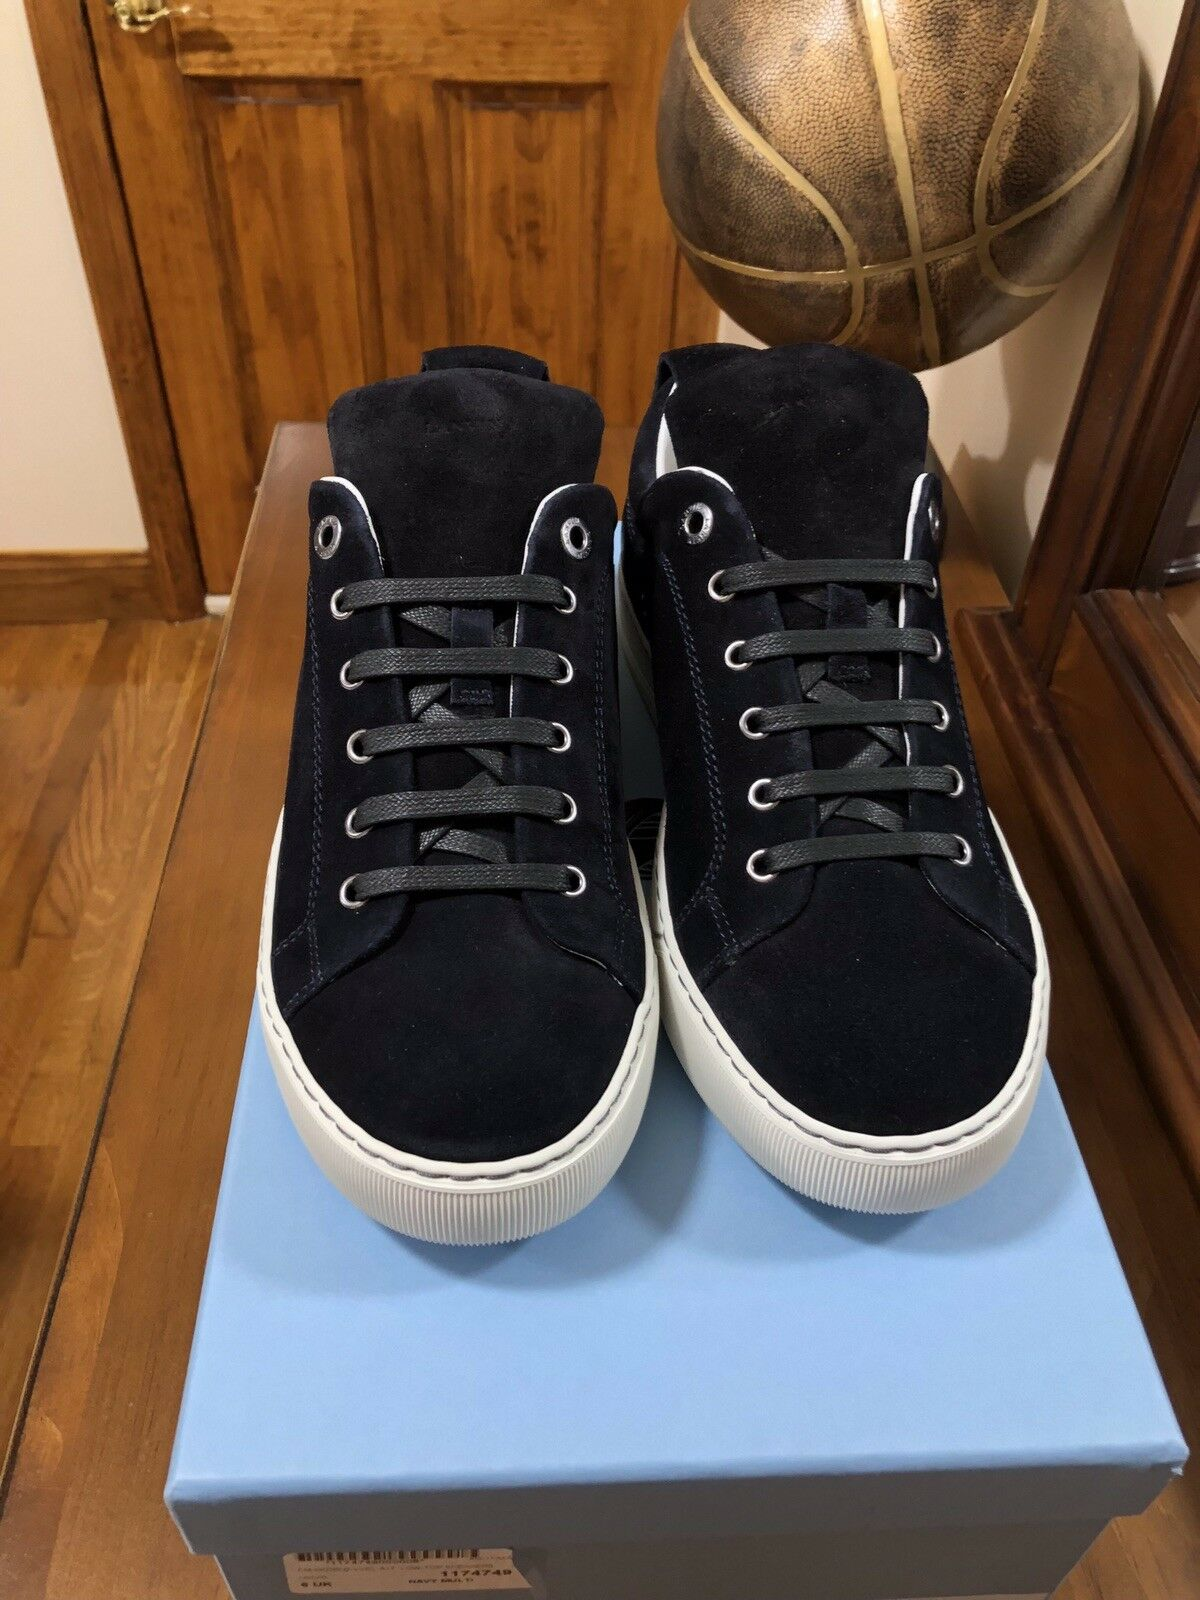 Lanvin Sneakers Men's size 7 US 6UK.